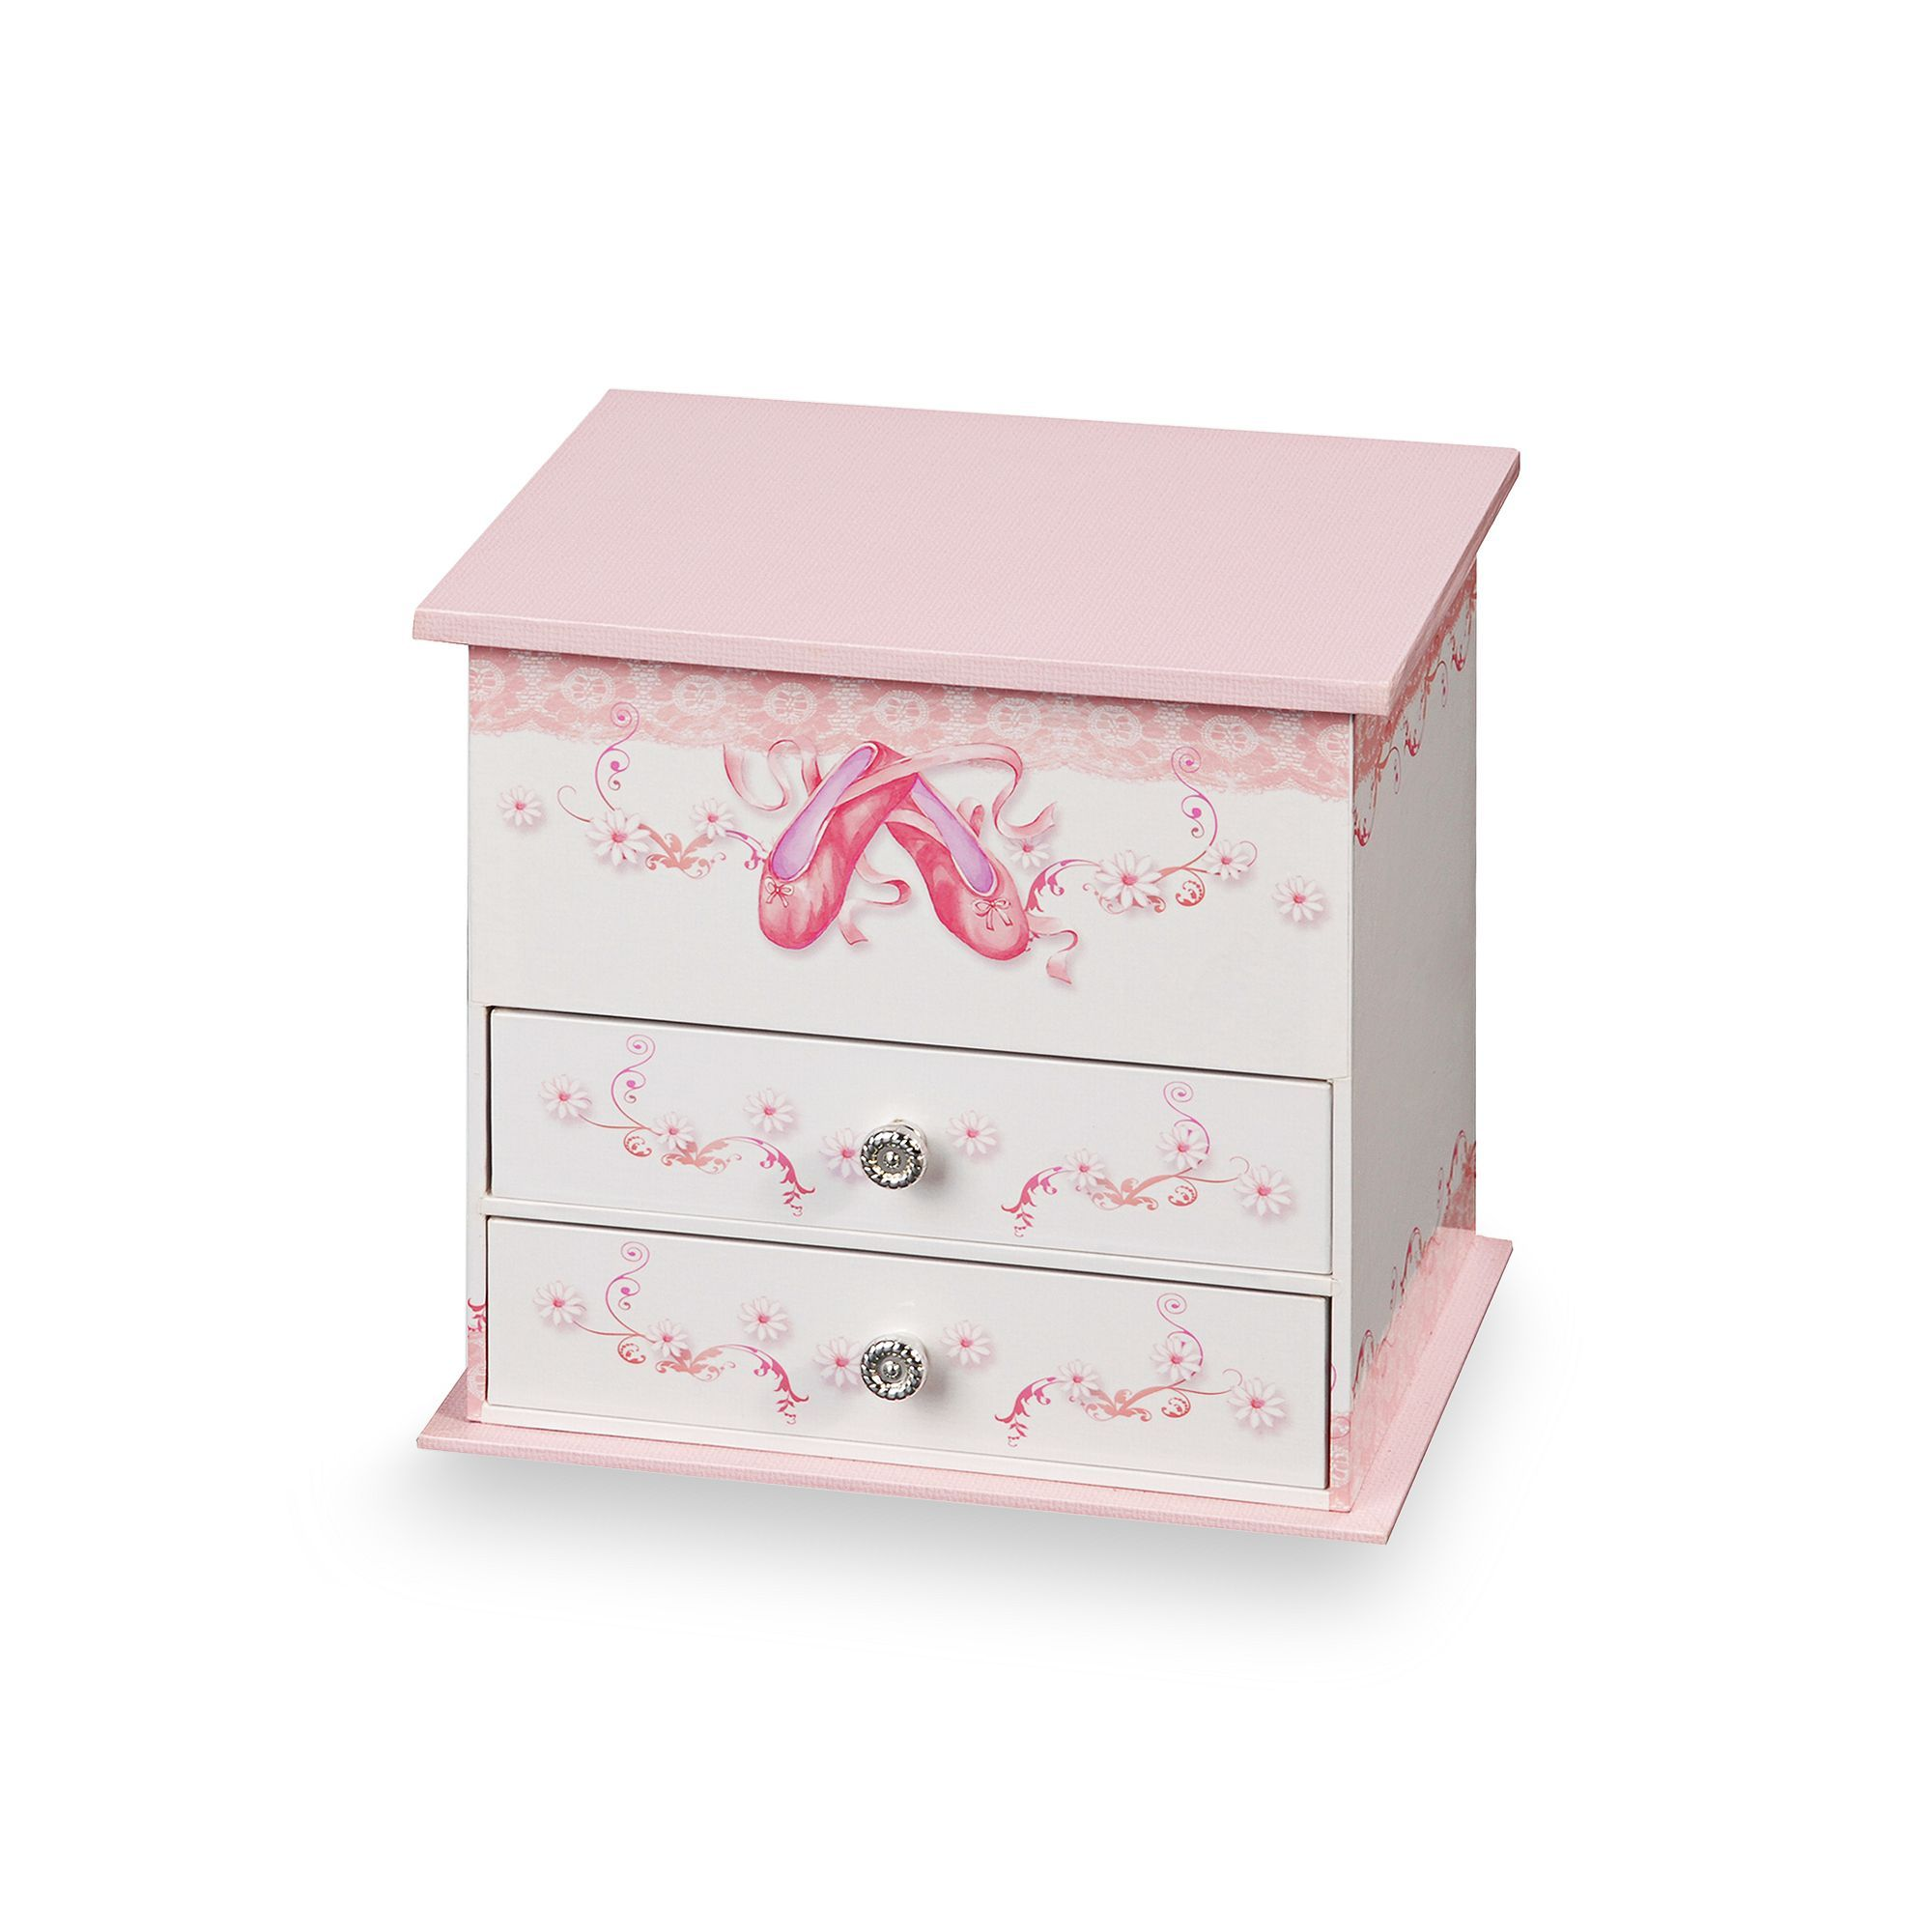 Mele Co Angel Ballerina Musical Jewelry Box Kids Multicolor